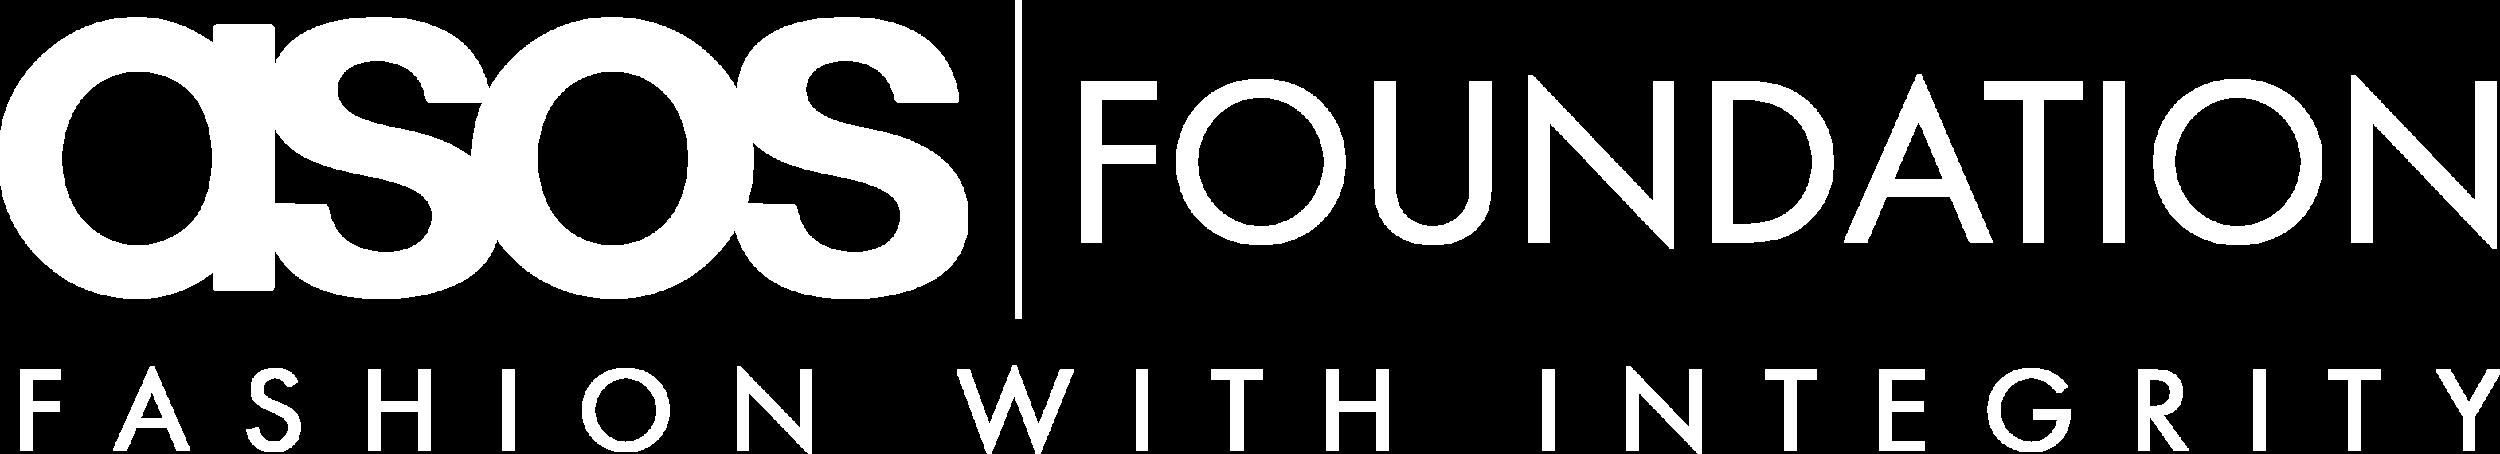 ASOS Foundation logo_white.png